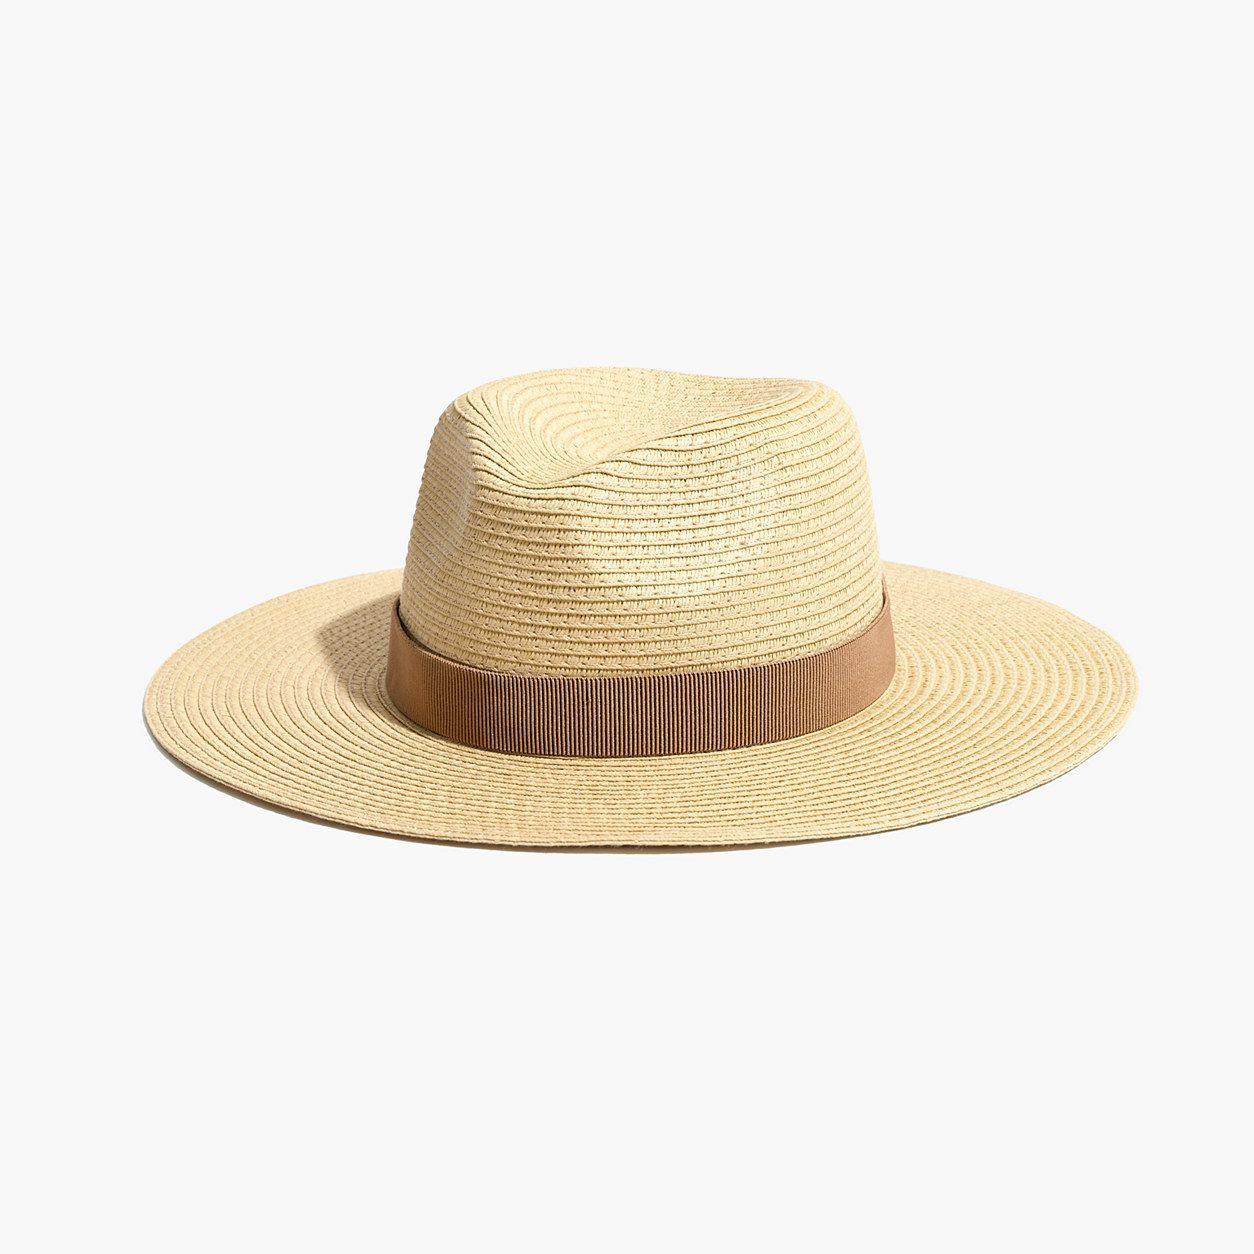 252bdb1d16066 Madewell Packable Mesa Straw Hat (Size M-L